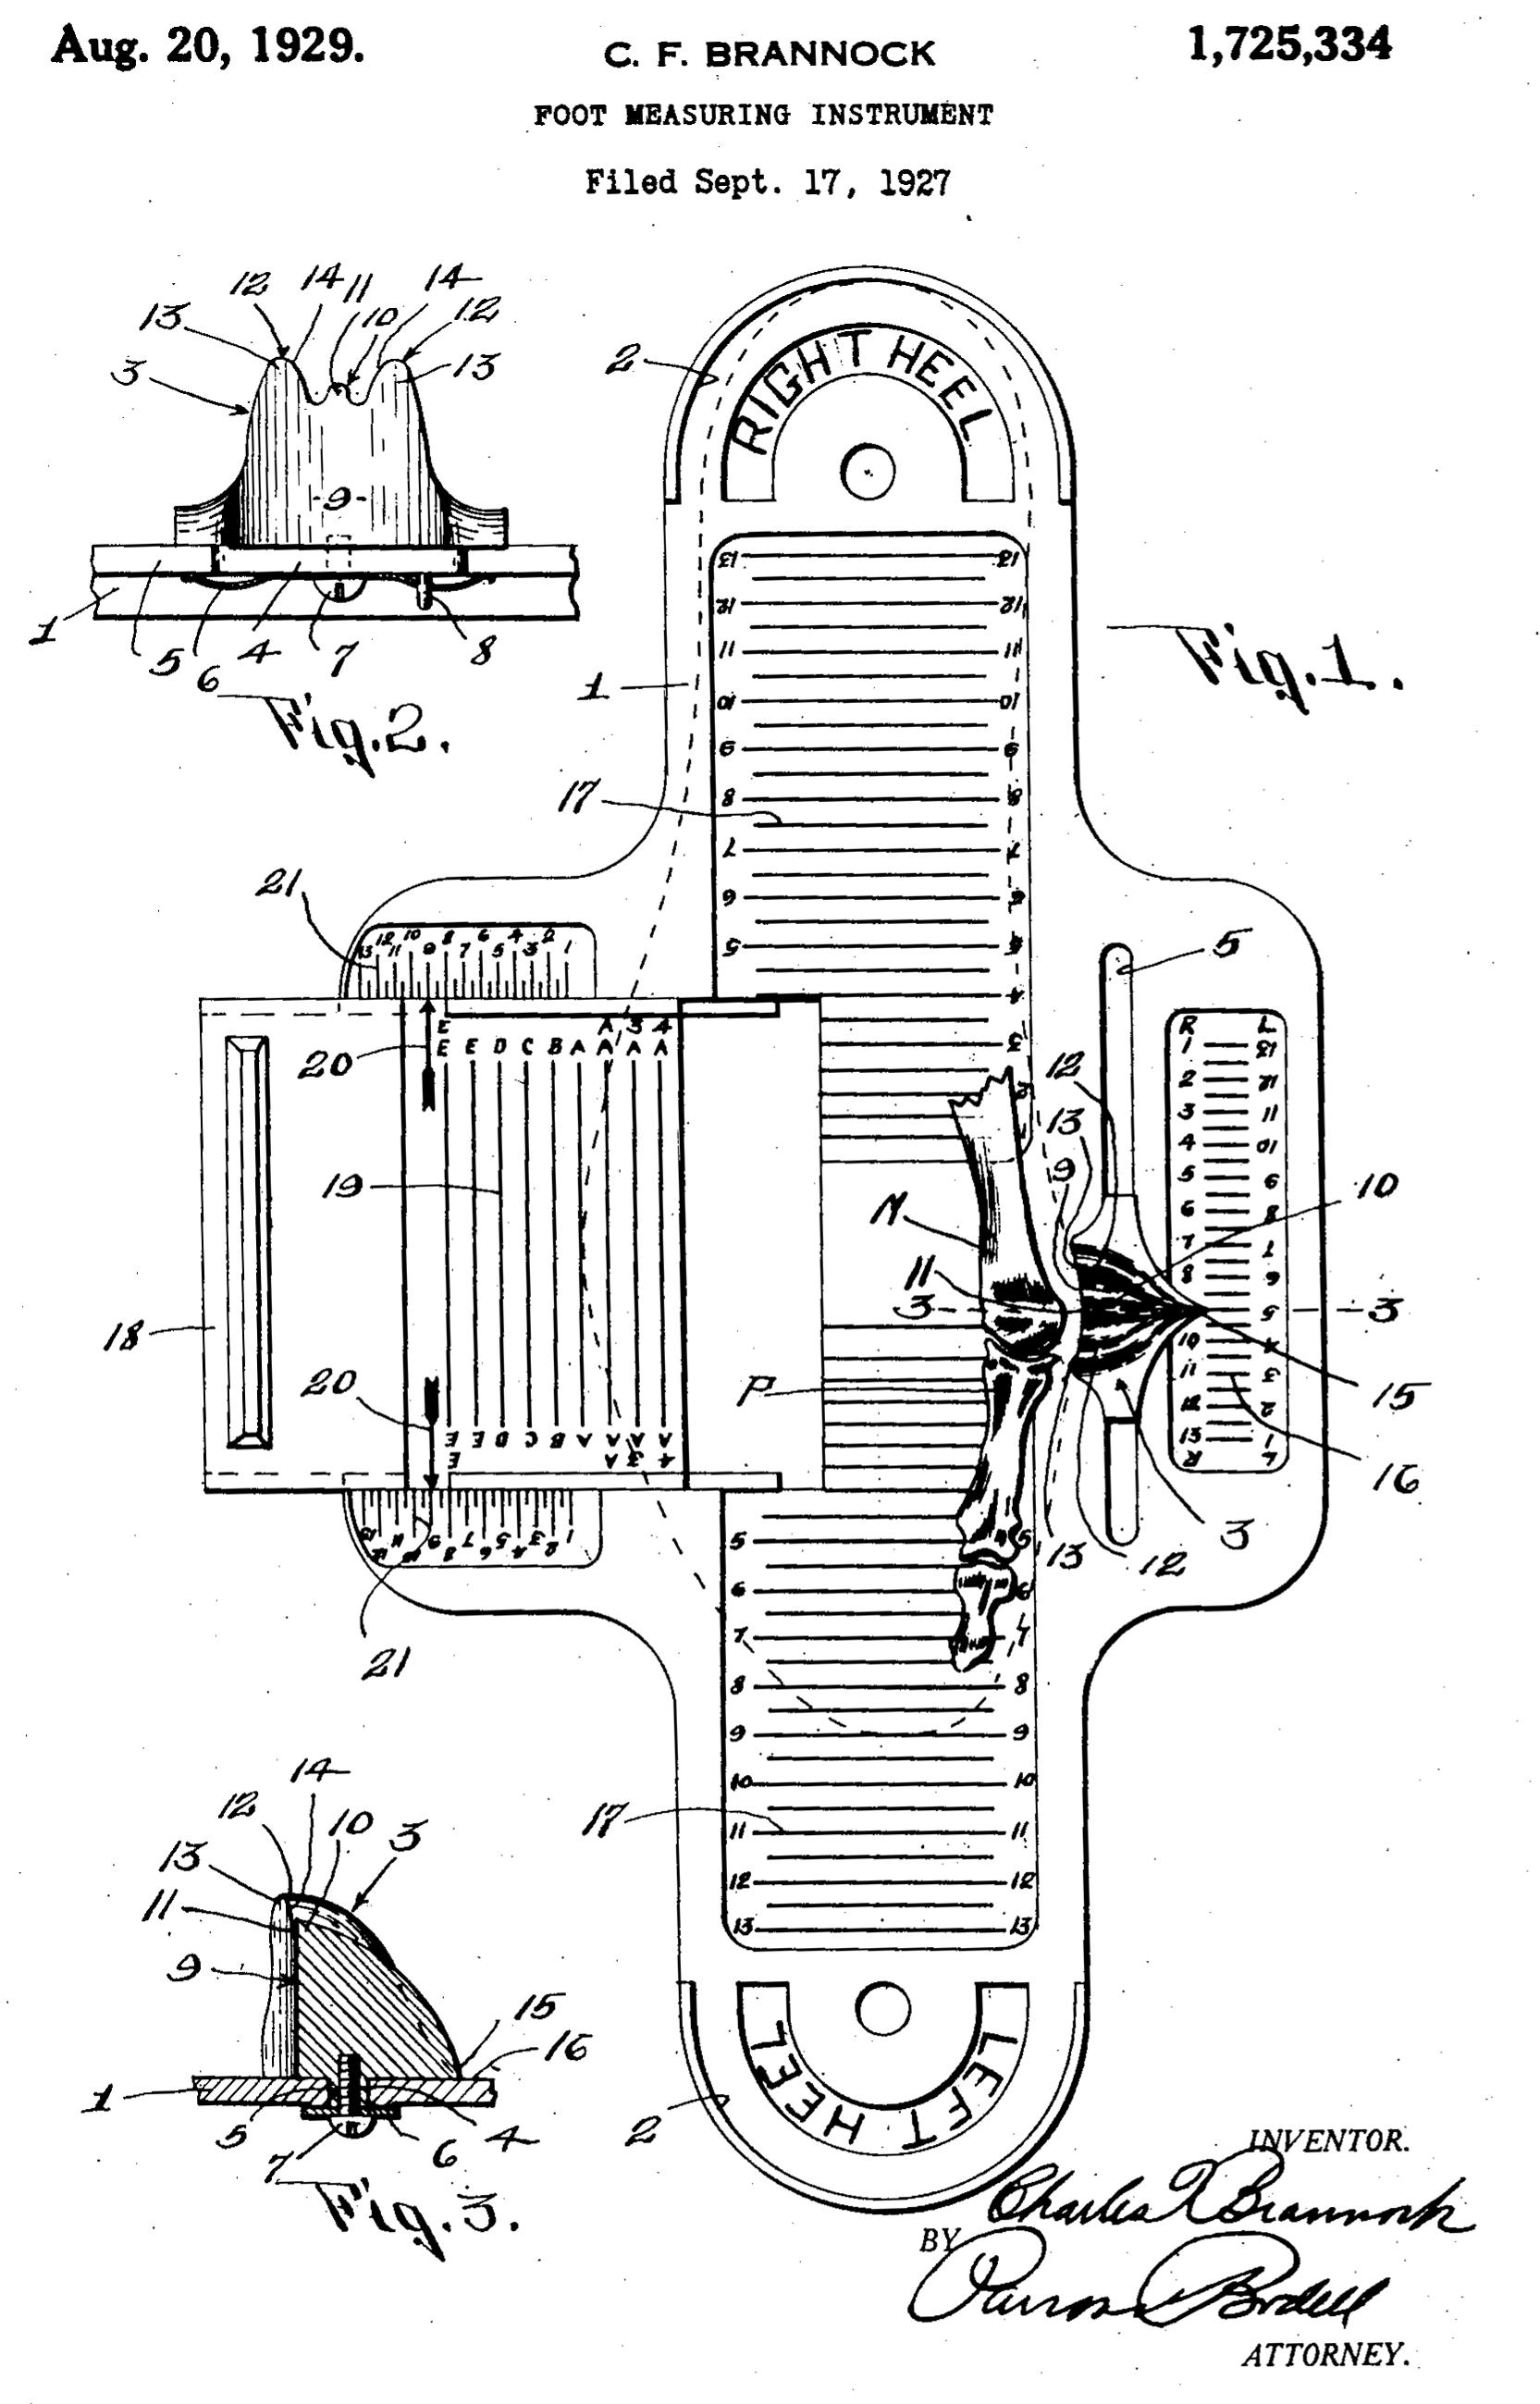 Printable Shoe Size Measuring Device